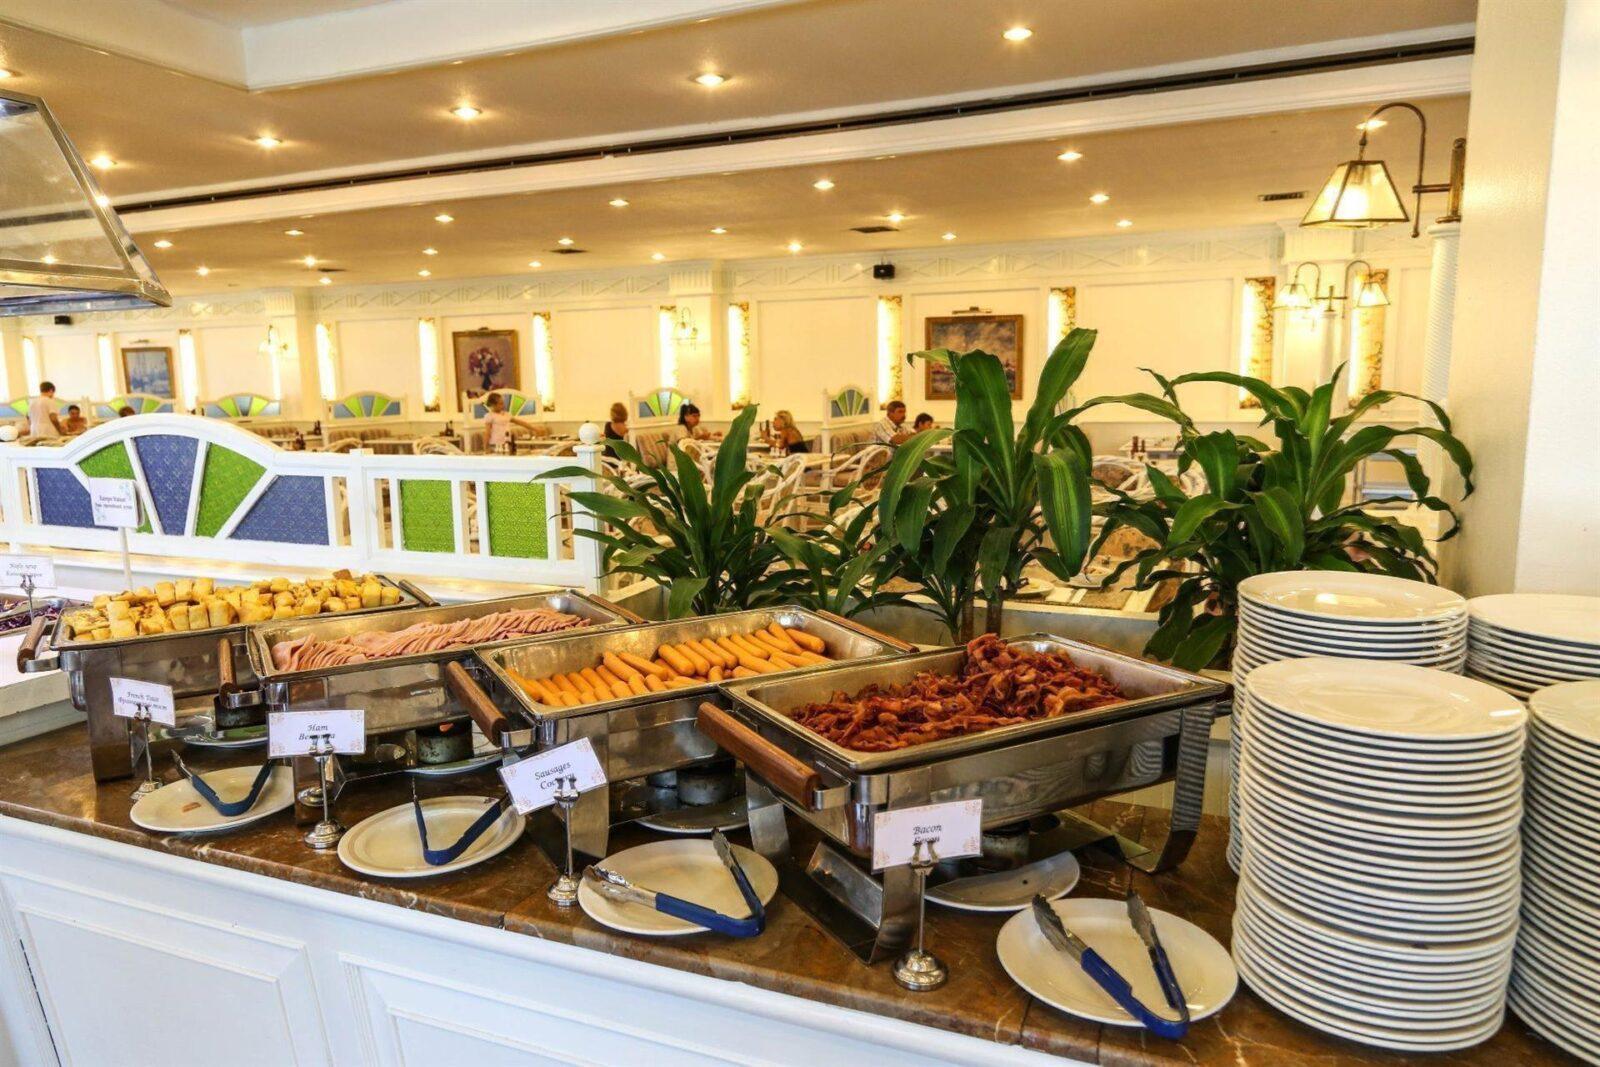 ОтельАмбассадор(Ambassador City Jomtien Garden Wing) вПаттайе